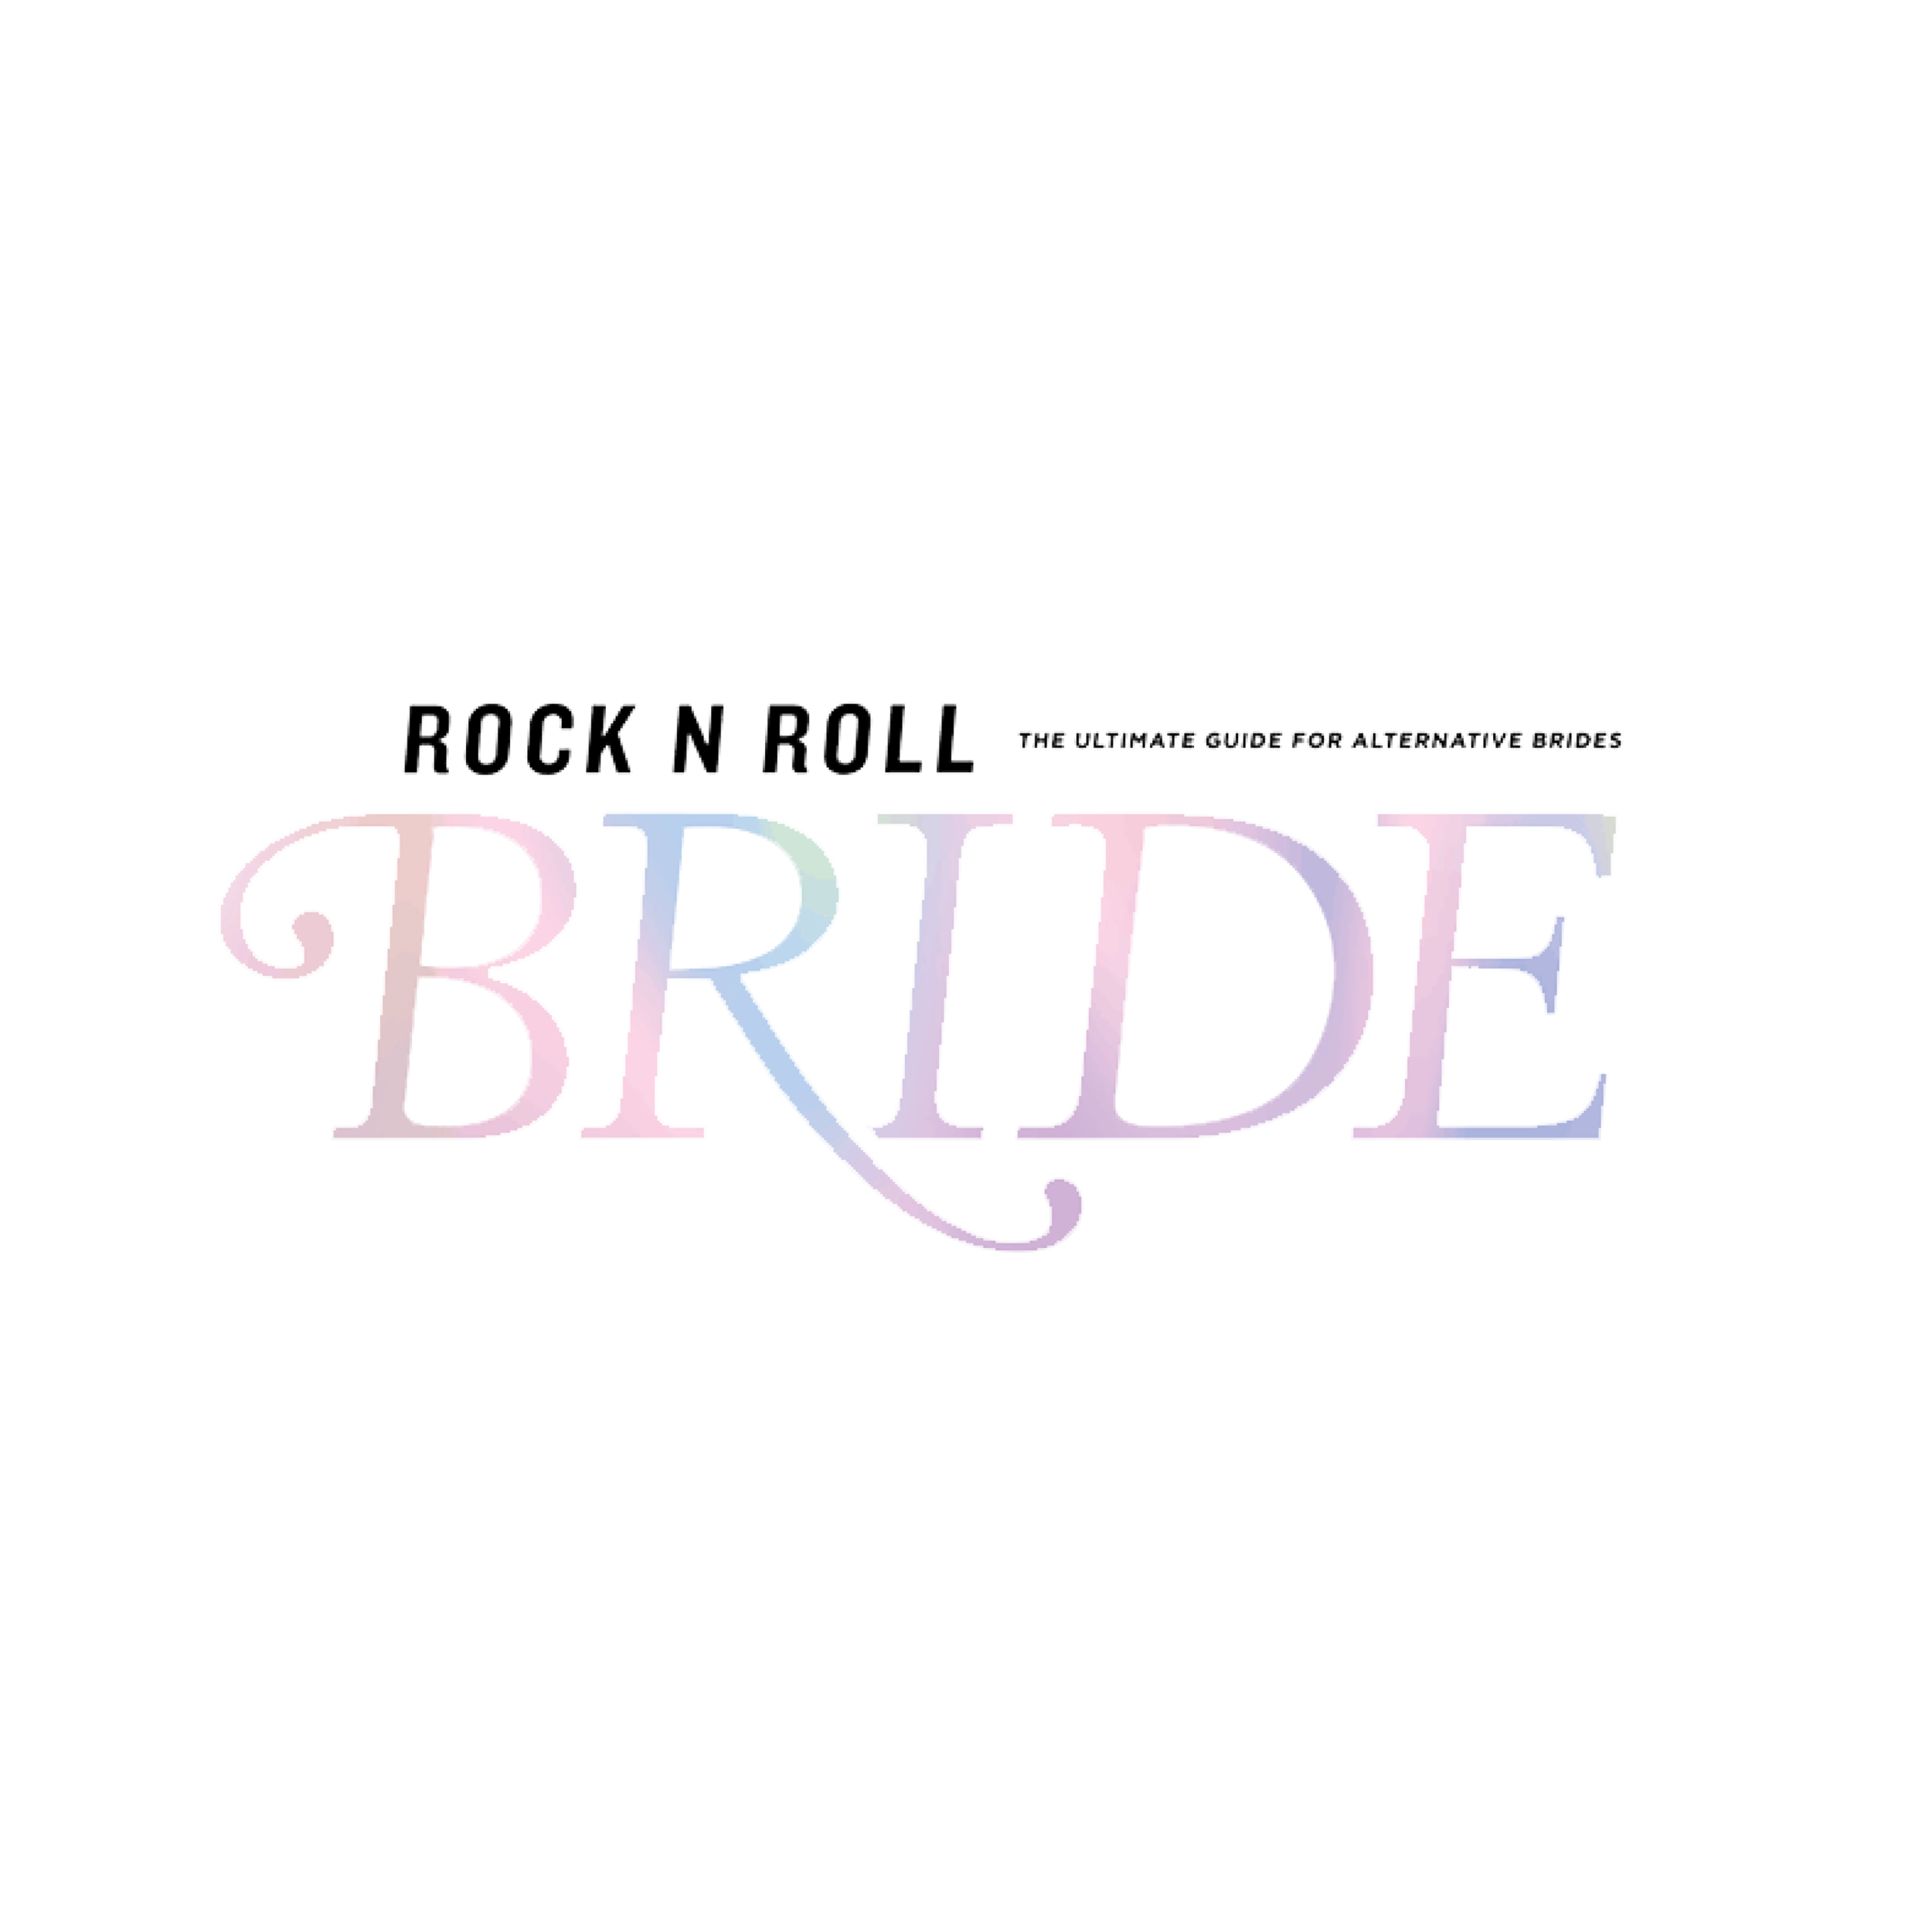 Terry Fox | Rock N Roll Bride